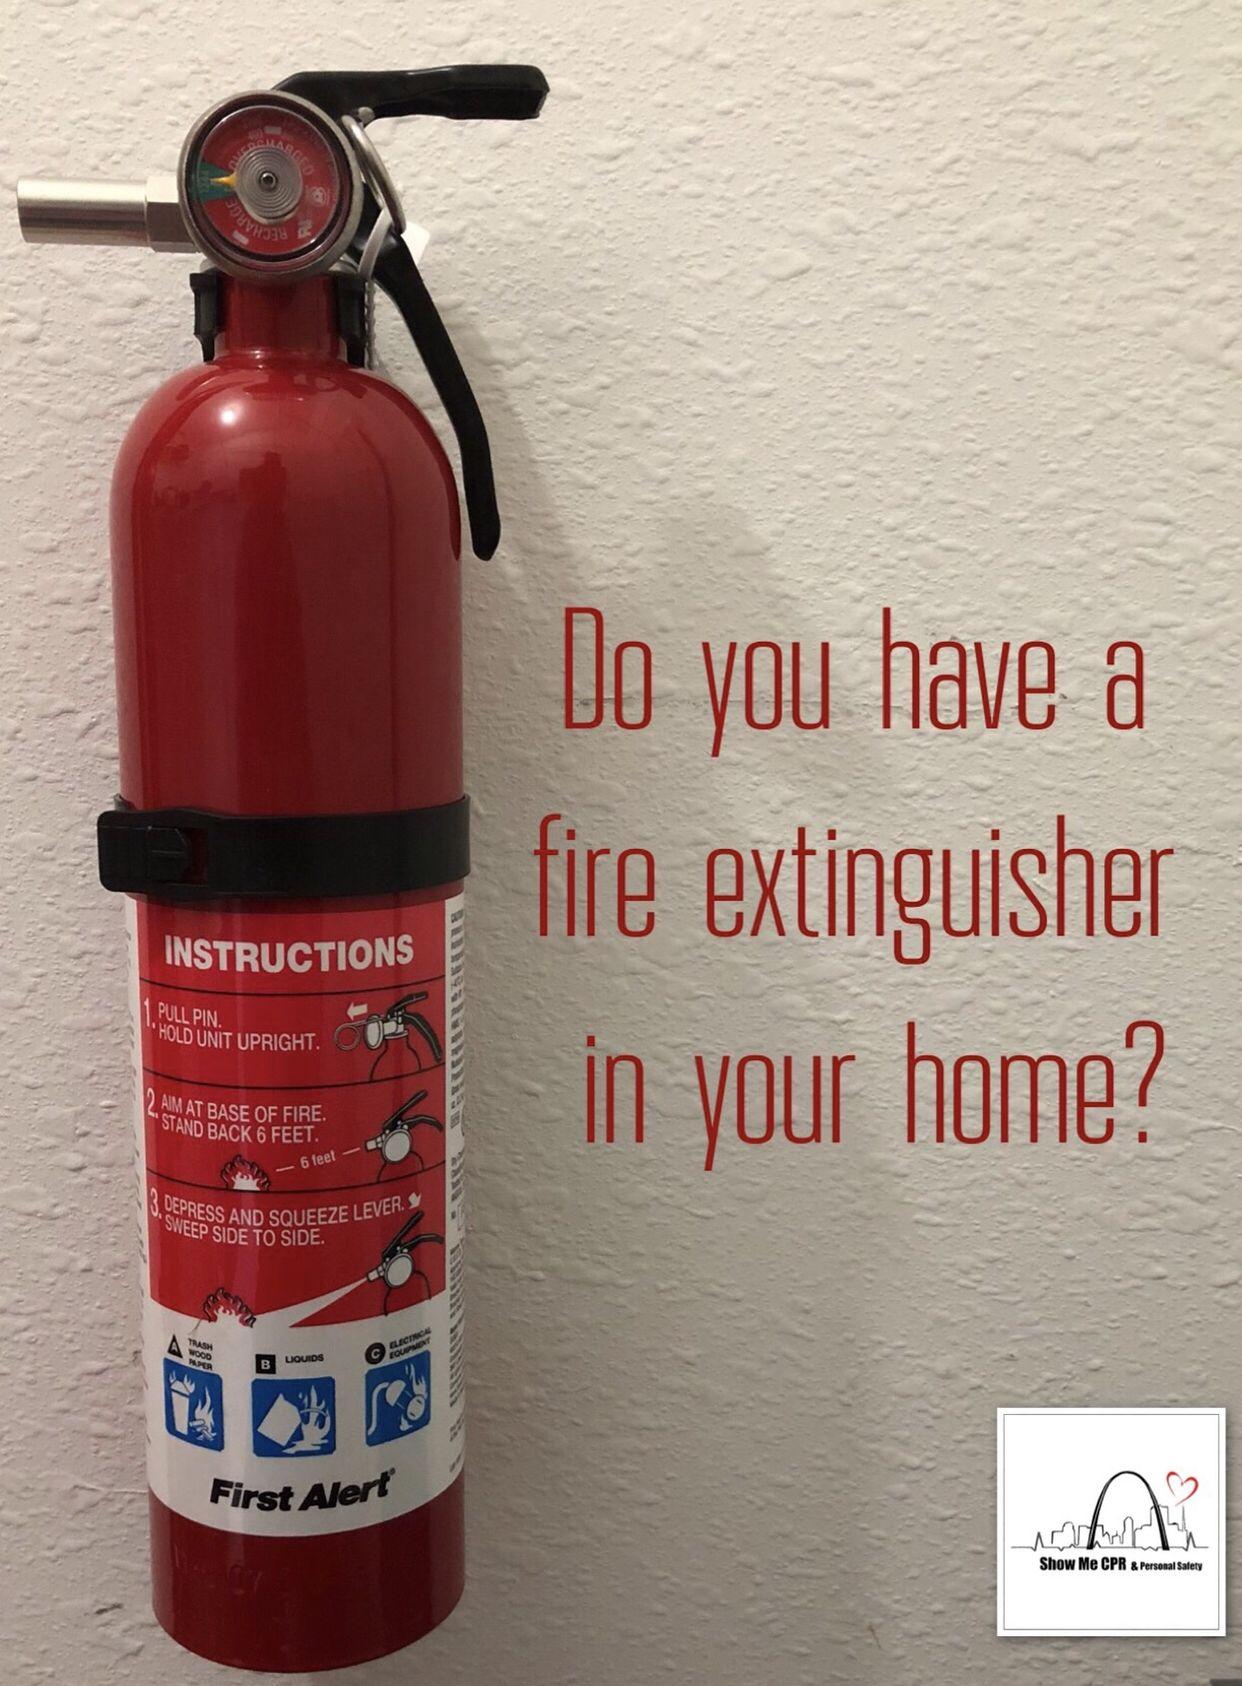 Sullivan, MO Fire extinguisher, Cpr, Fire extinguishers